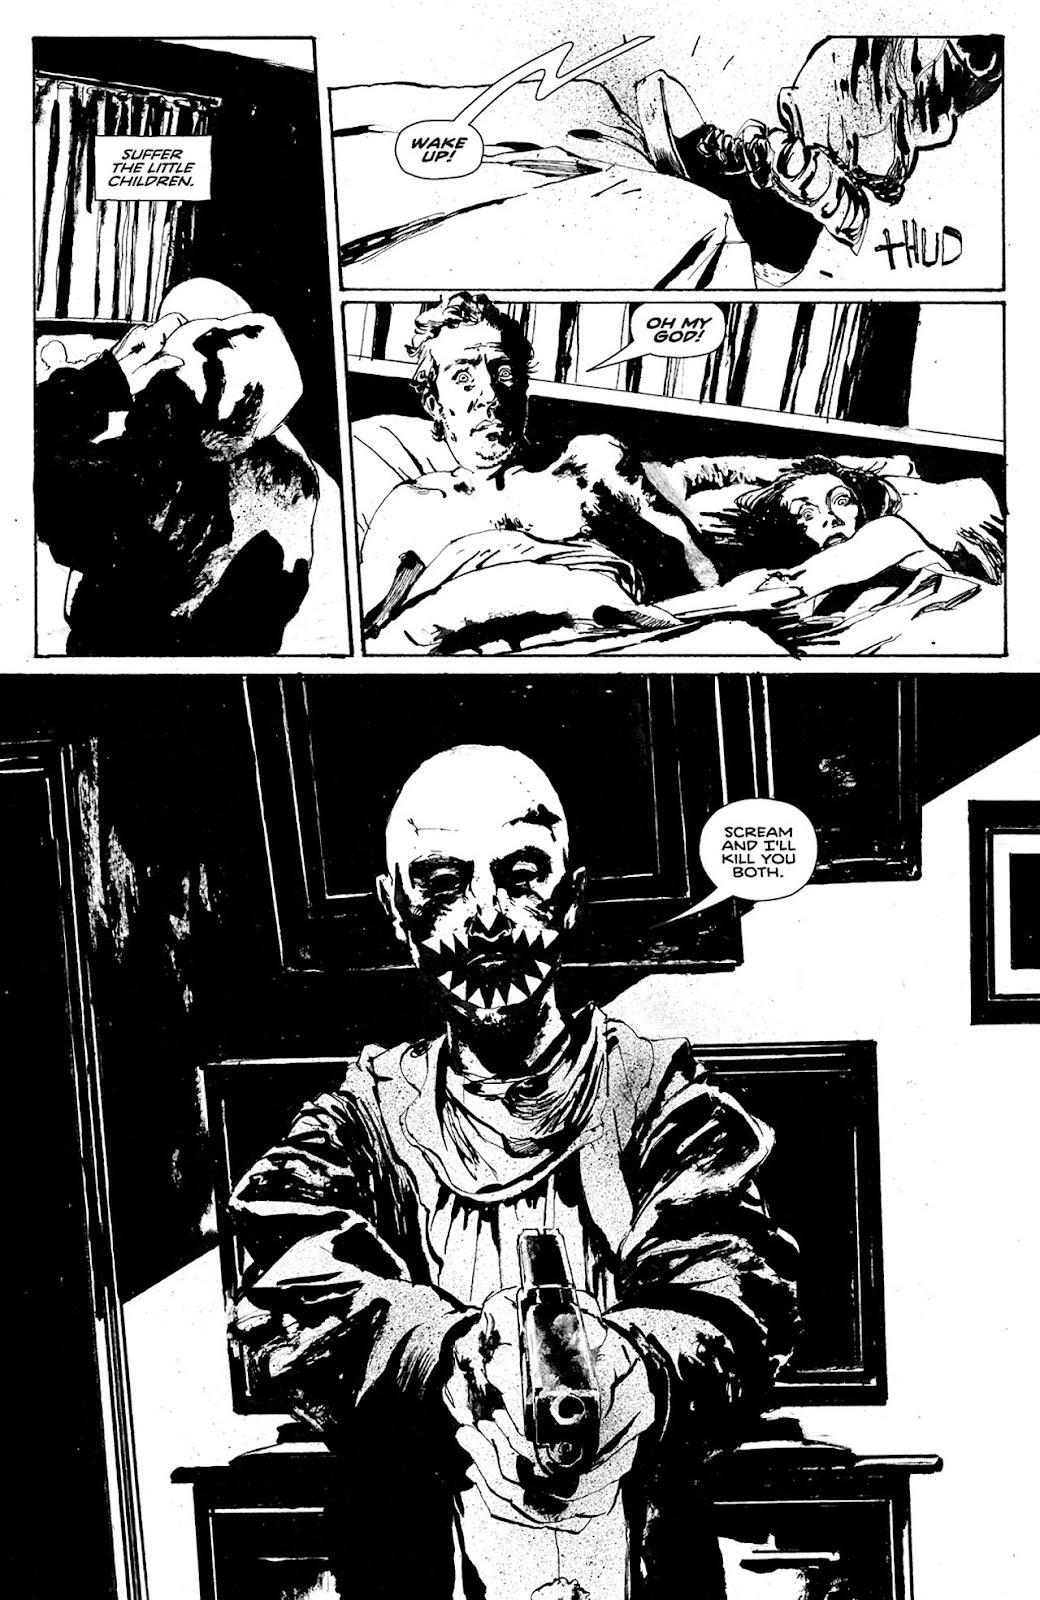 Creepy (2009) Issue #6 #6 - English 22